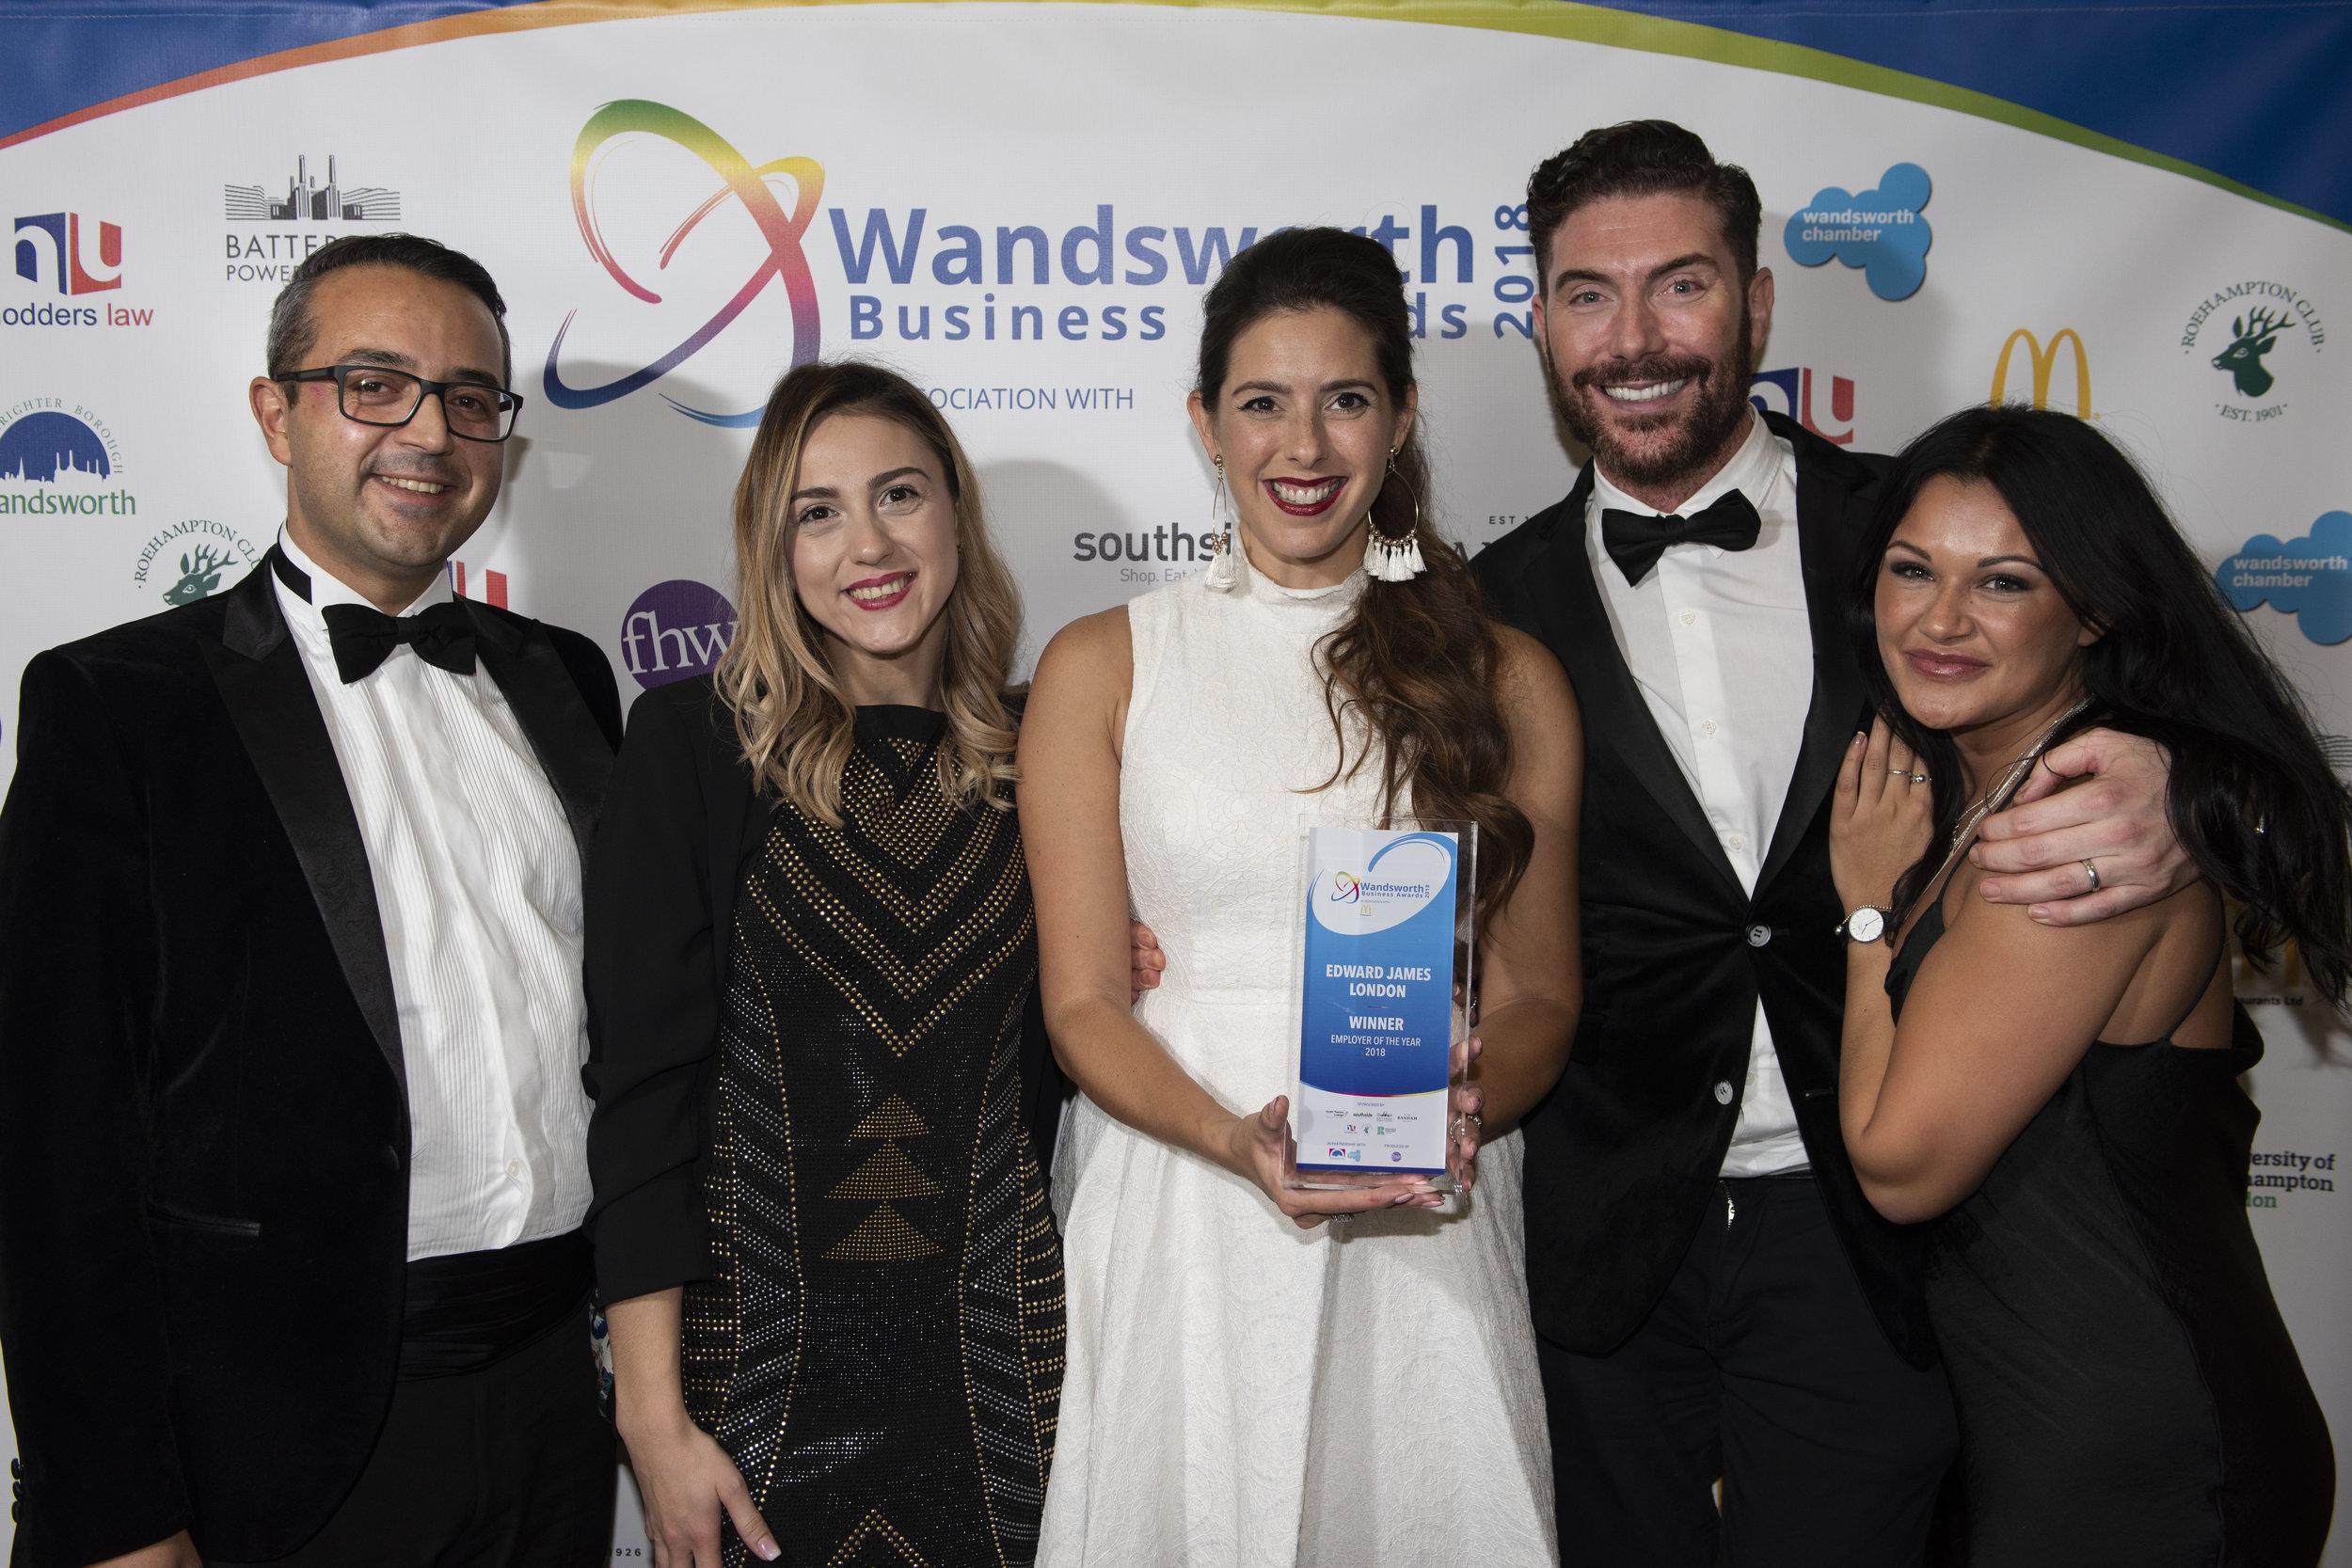 WANDSWORTH-WINNERS-2018_003 employer.jpg